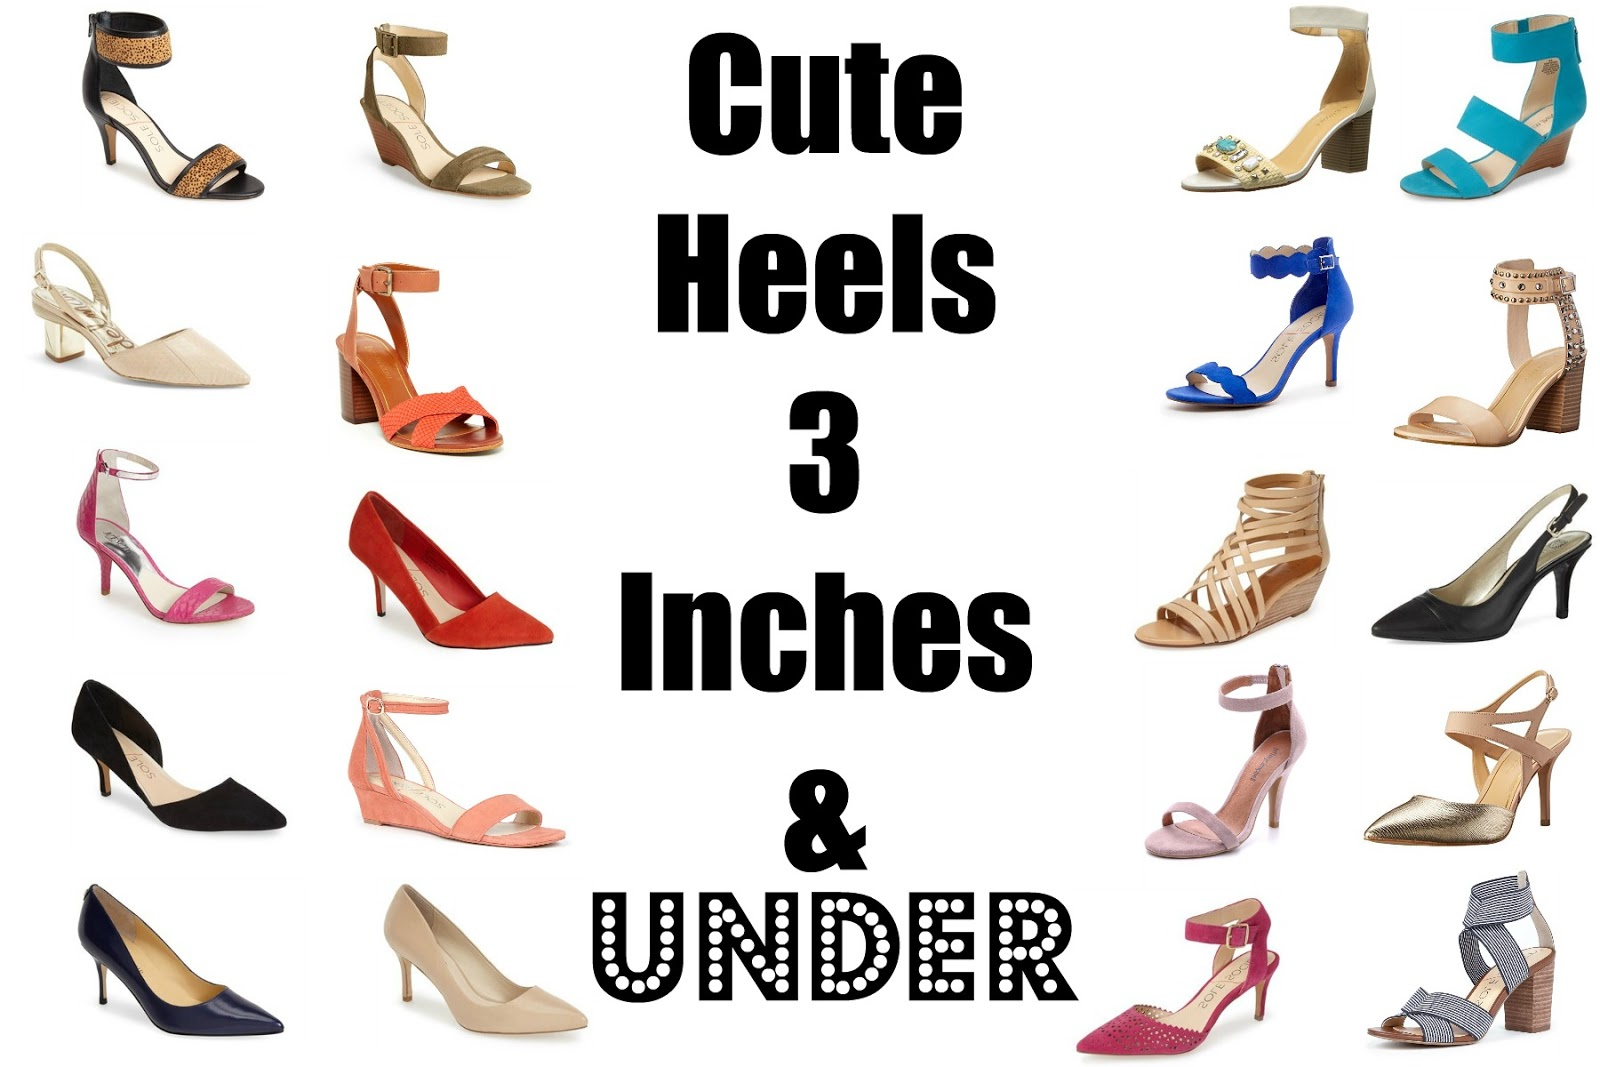 Cute heels 3 inches under altavistaventures Images